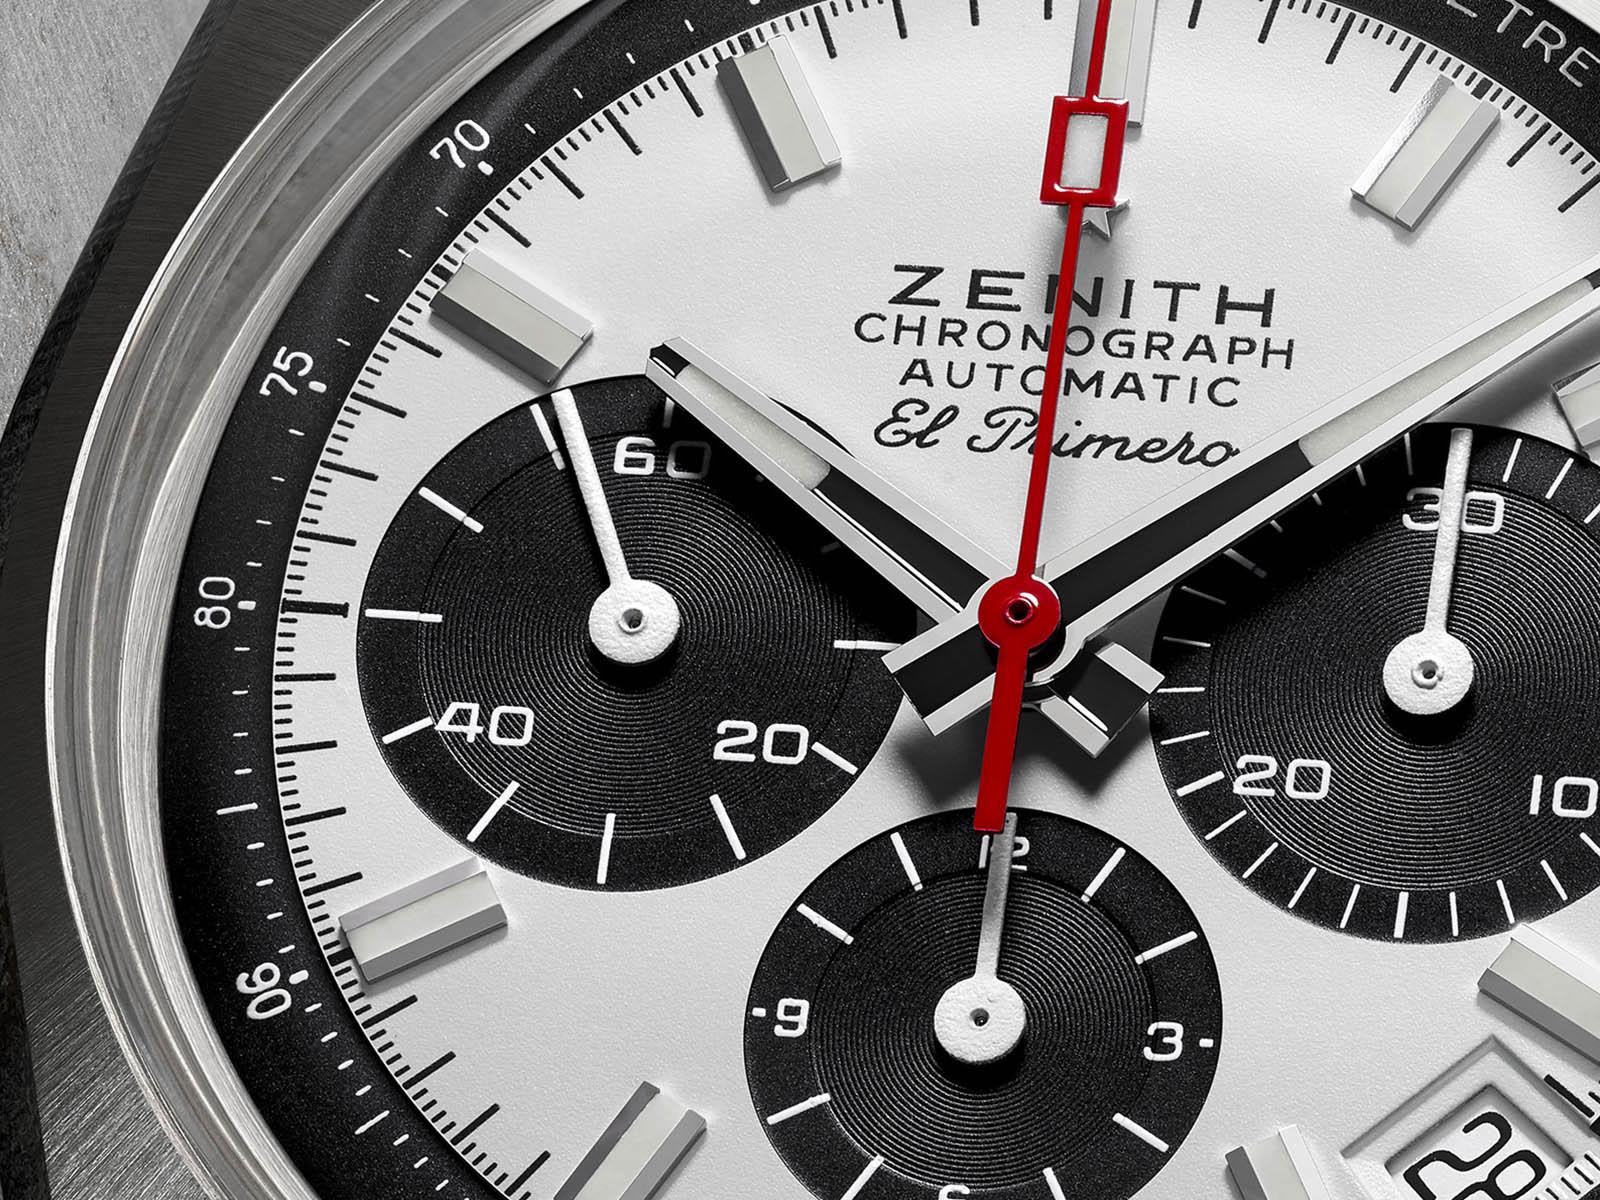 03-a384-400-21-c815-zenith-el-primero-a384-revival-2.jpg